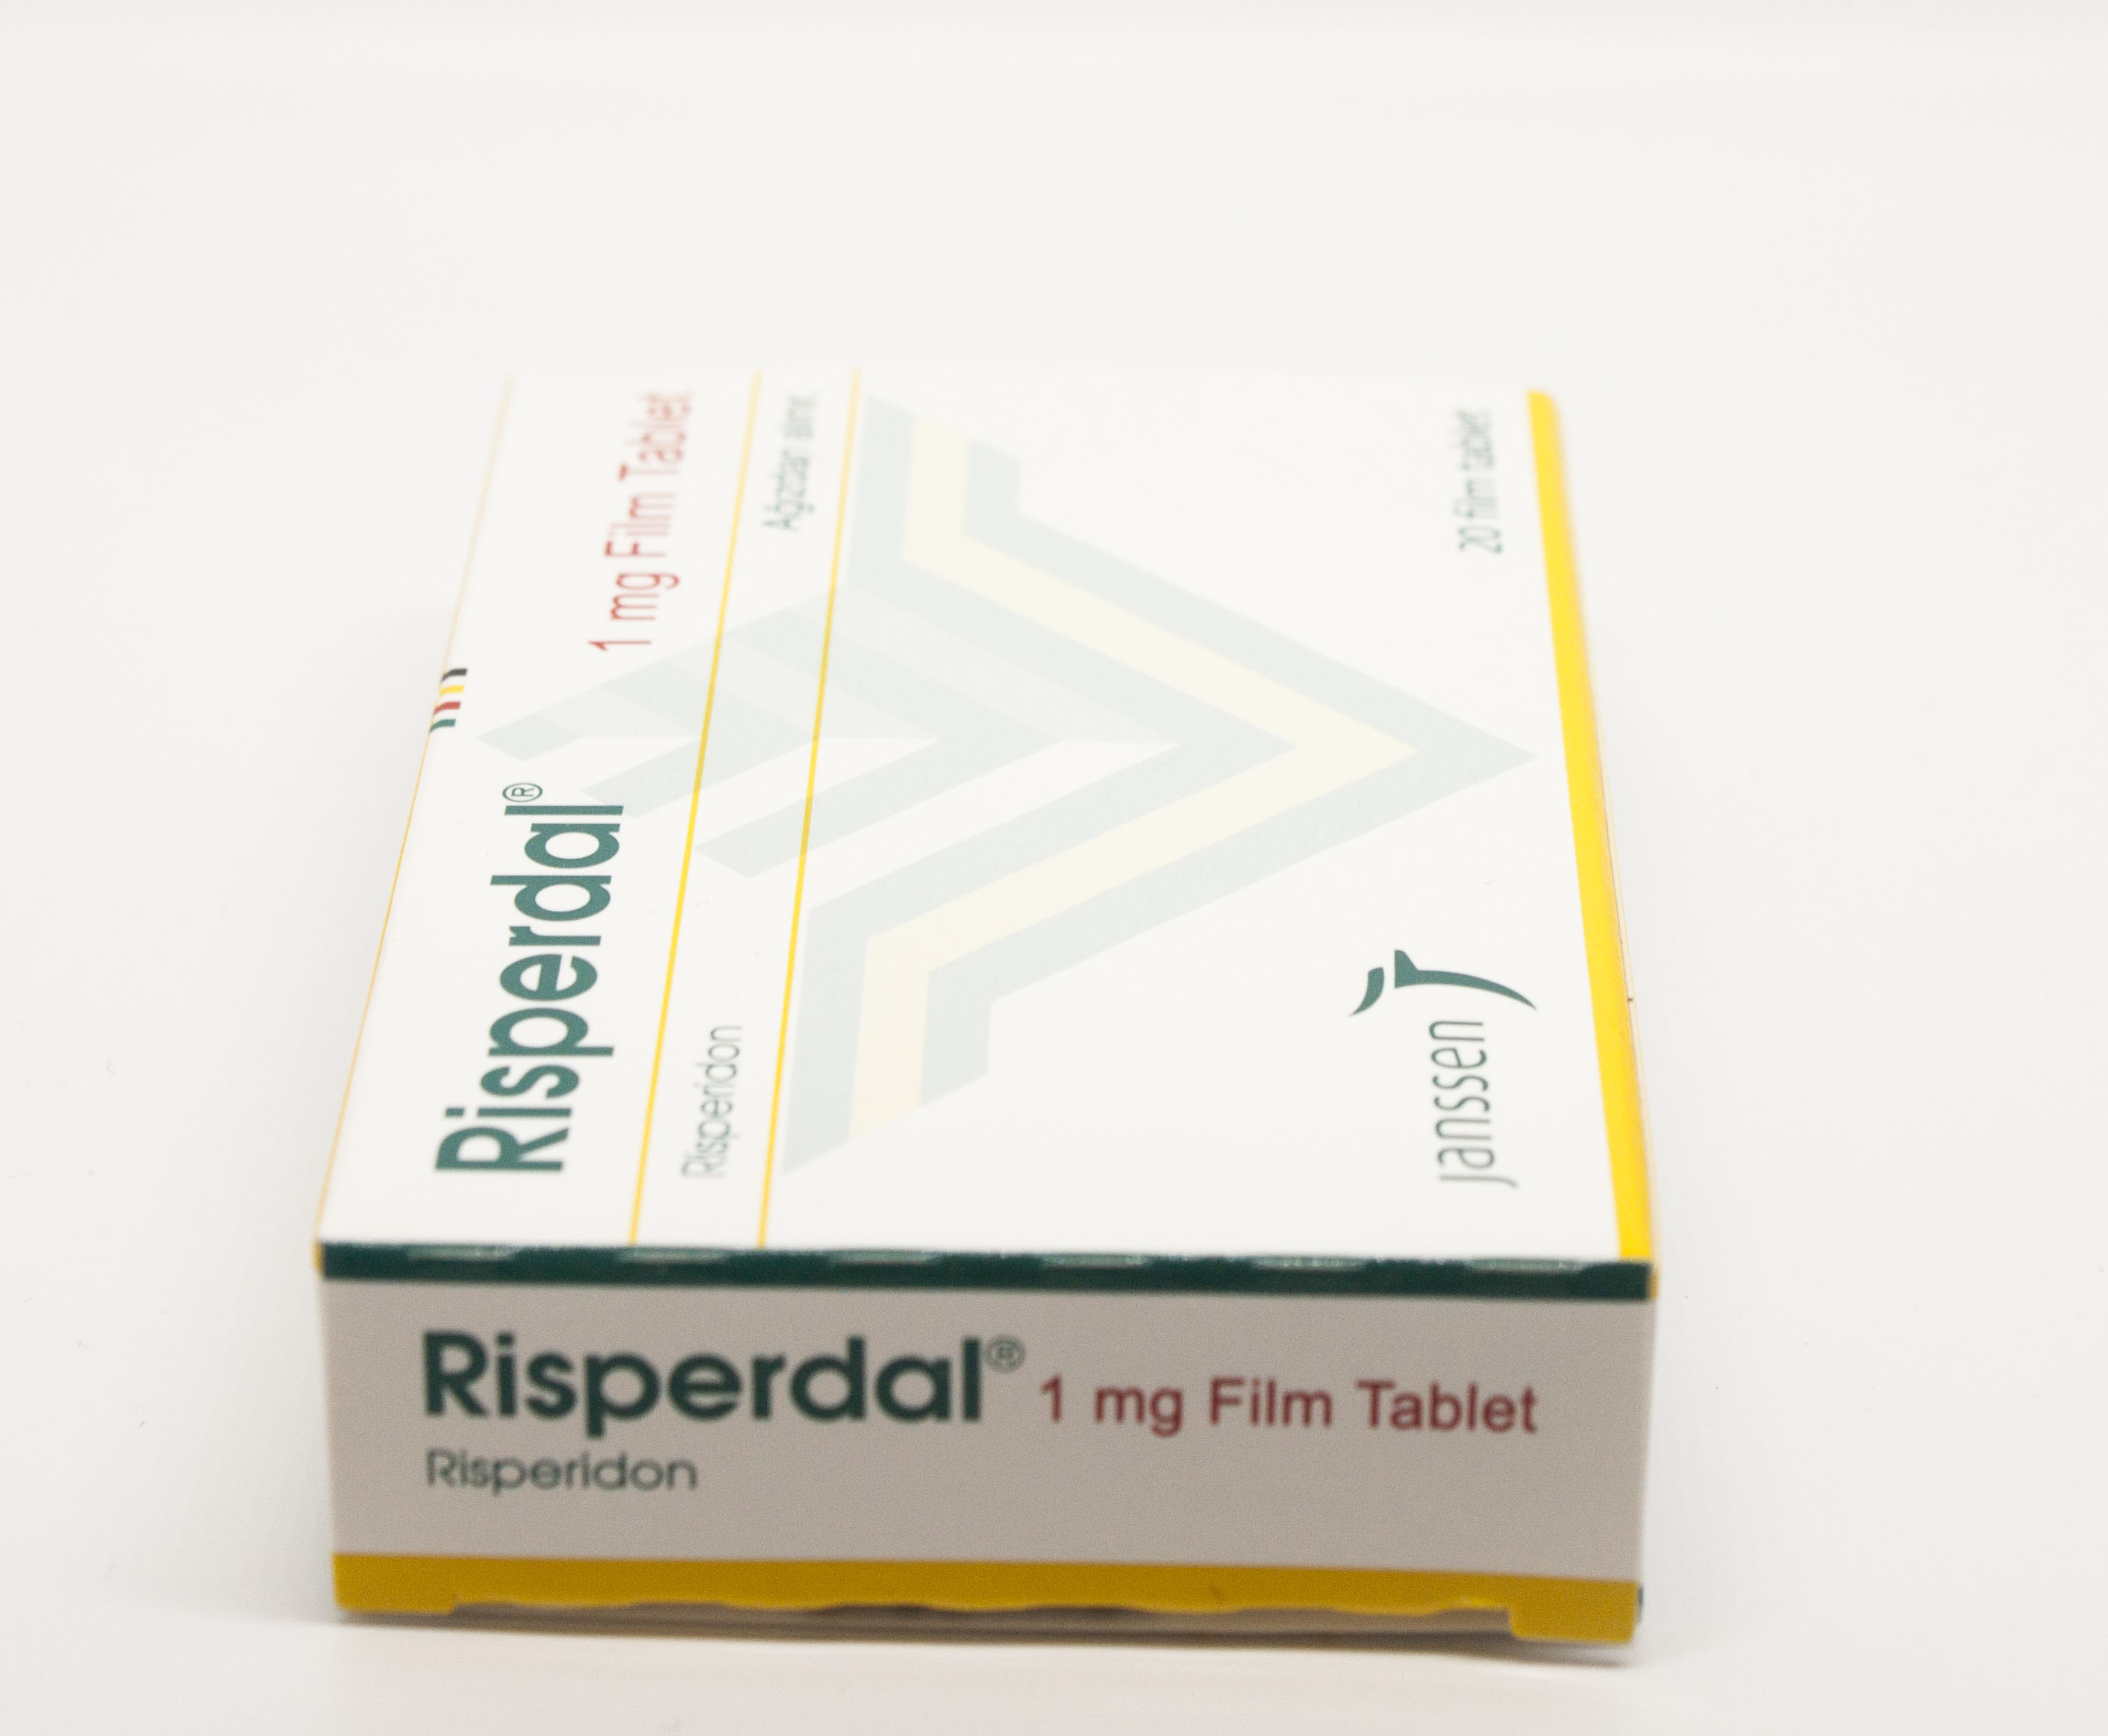 risperdal-1-mg-20-tablet-ac-halde-mi-yoksa-tok-halde-mi-kullanilir